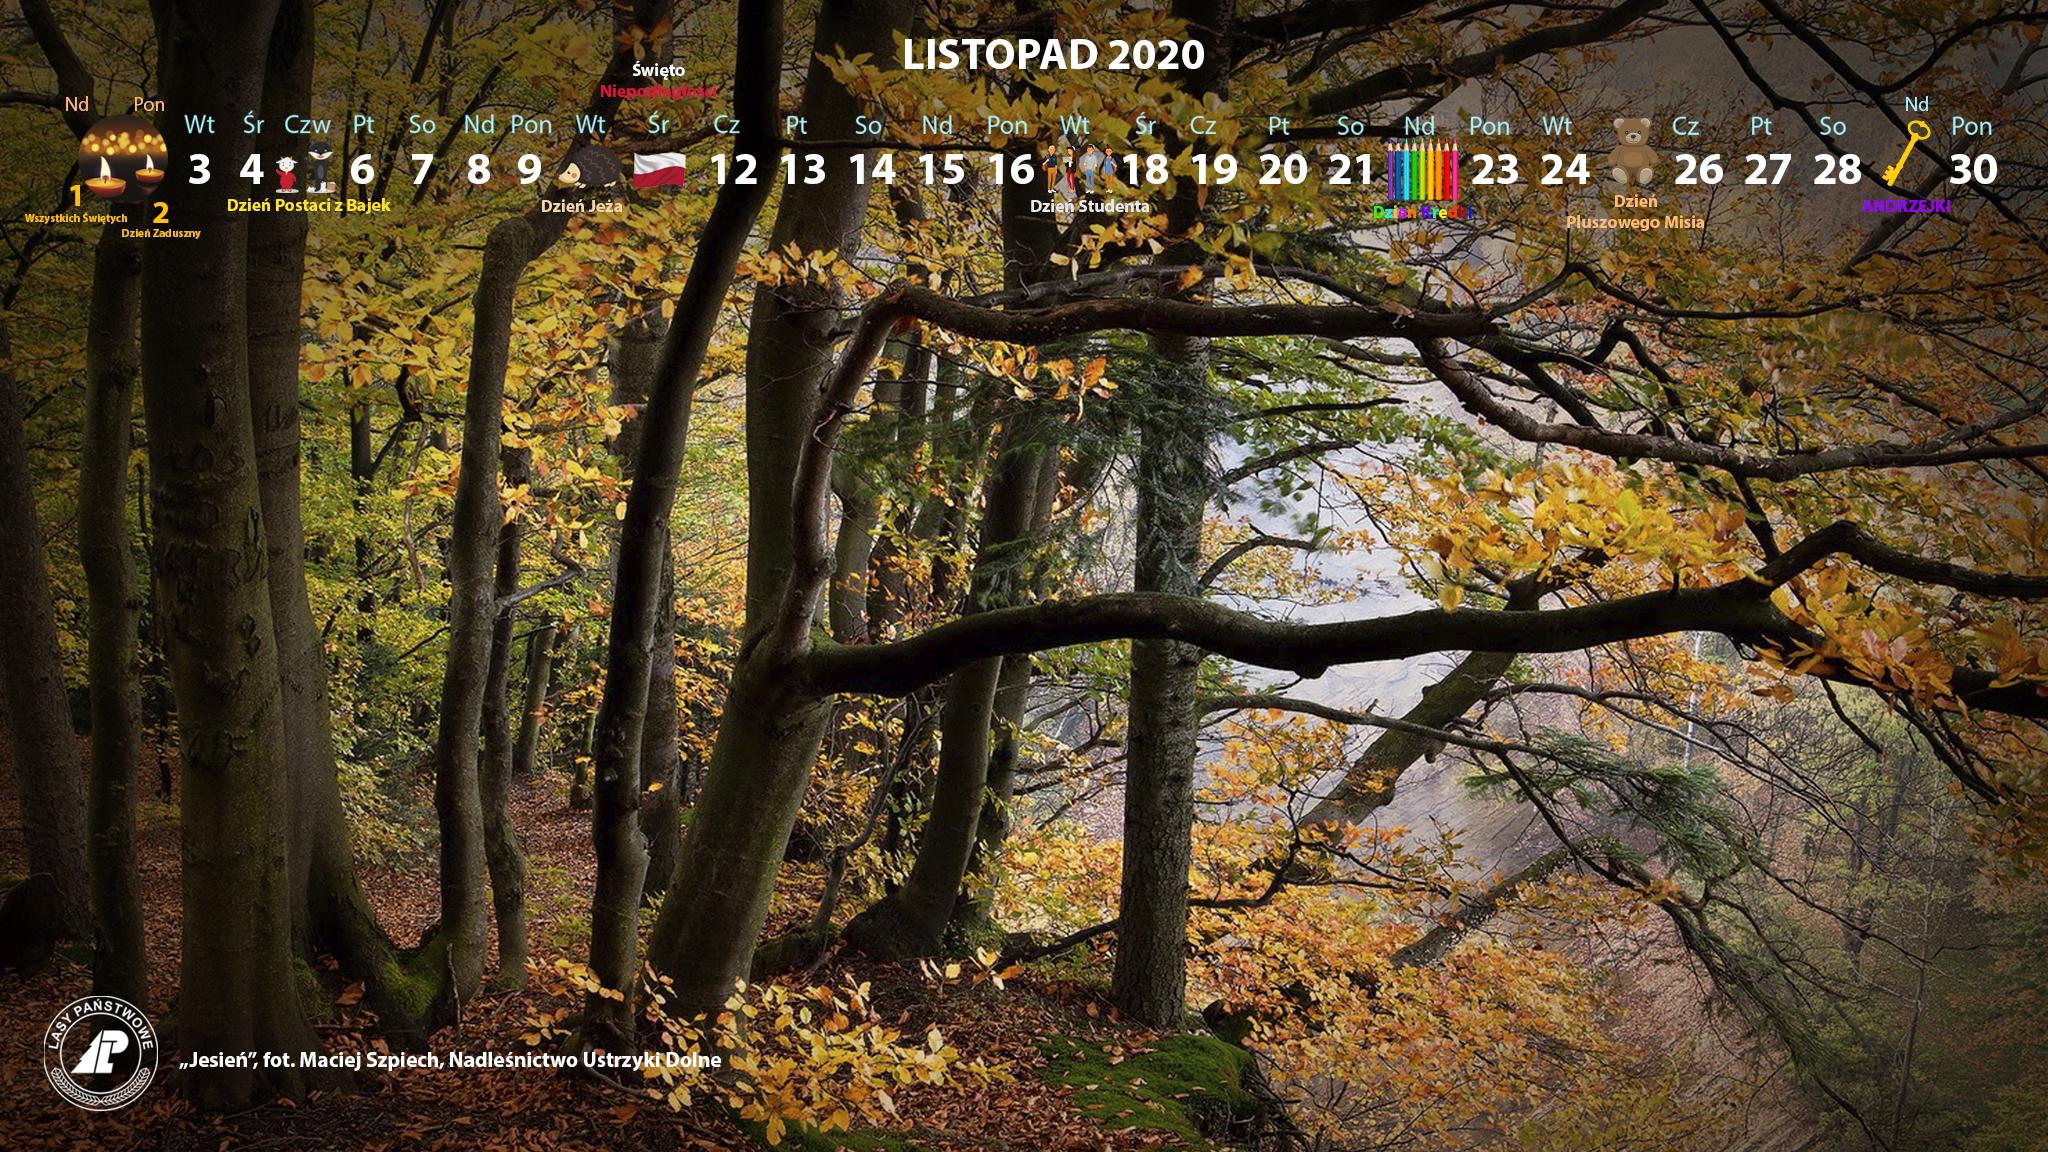 Kalendarz_listopad_2020_2048x1152[1].jpg